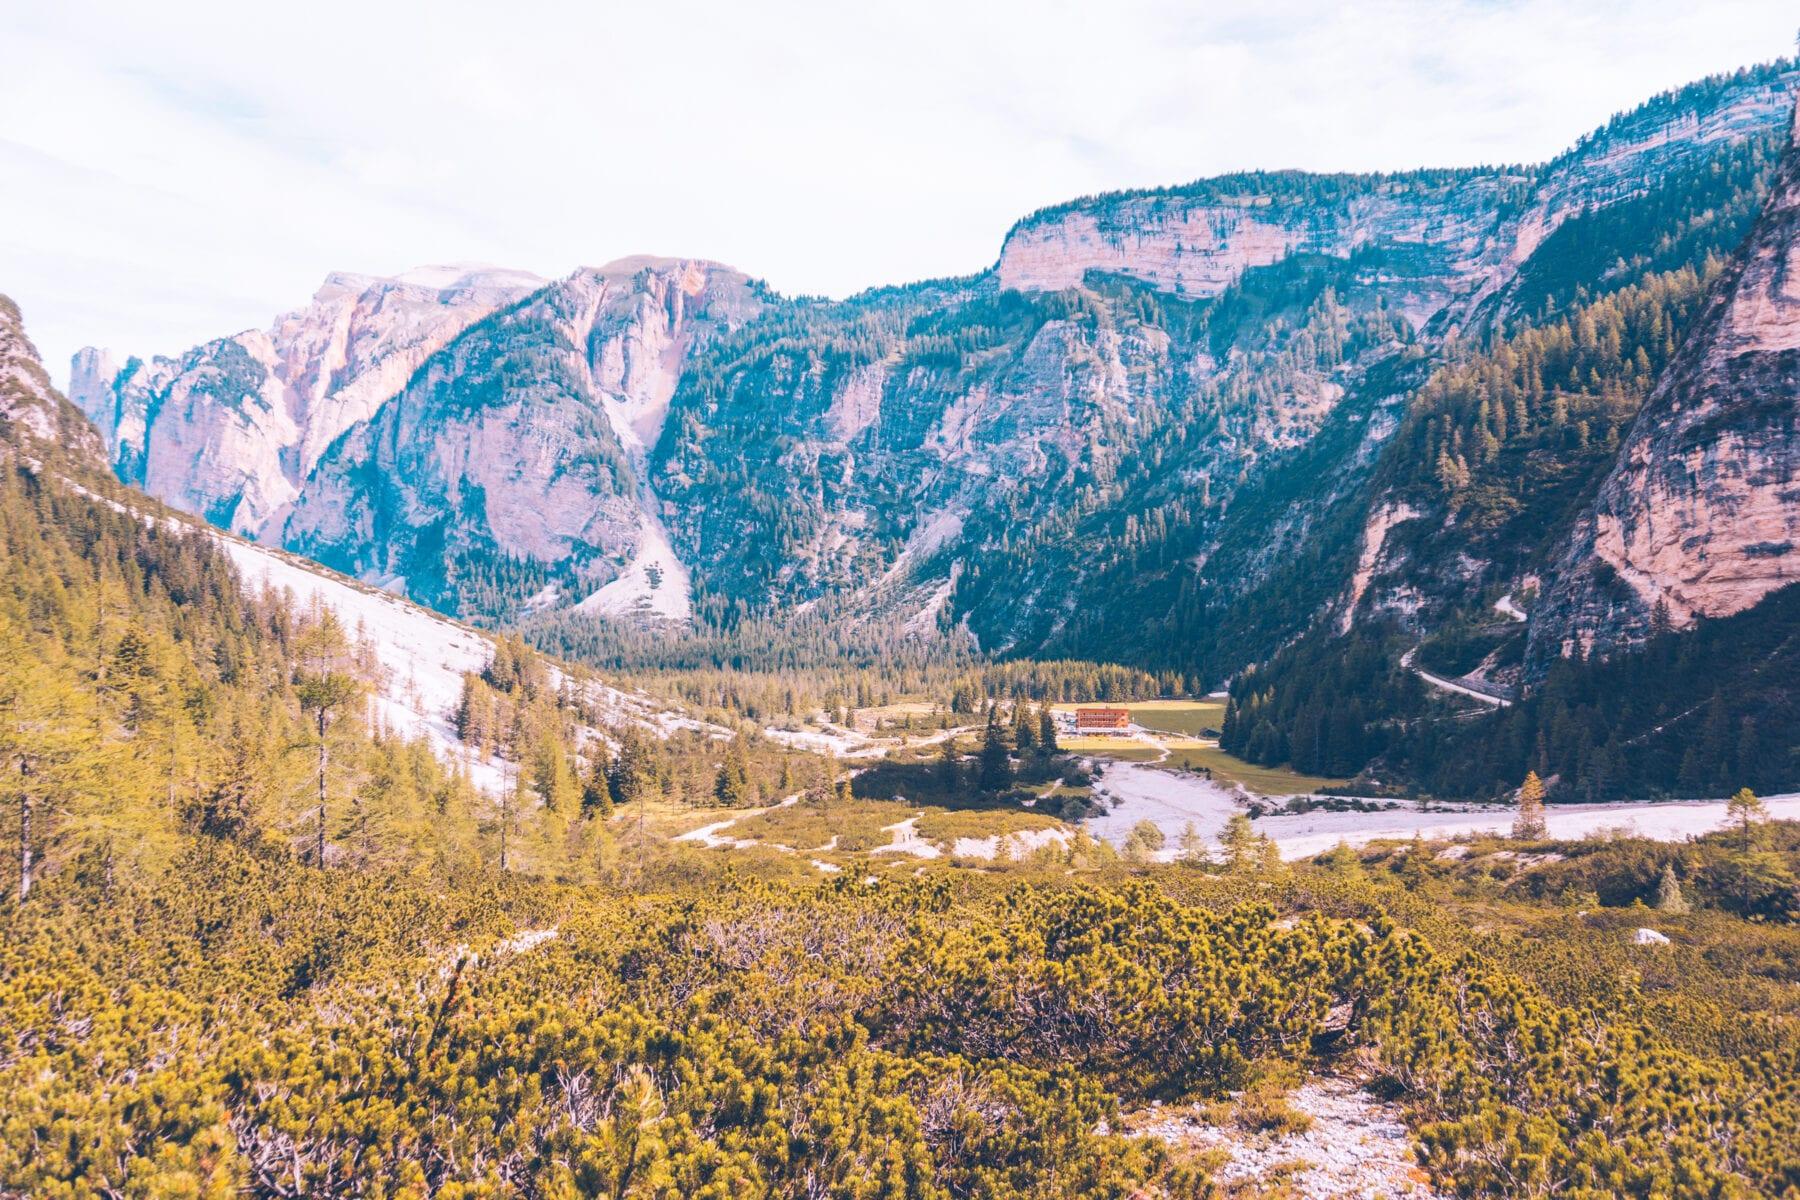 Fanes-Sennes-Prags-San Vigilio di Marebbe-Zuid Tirol